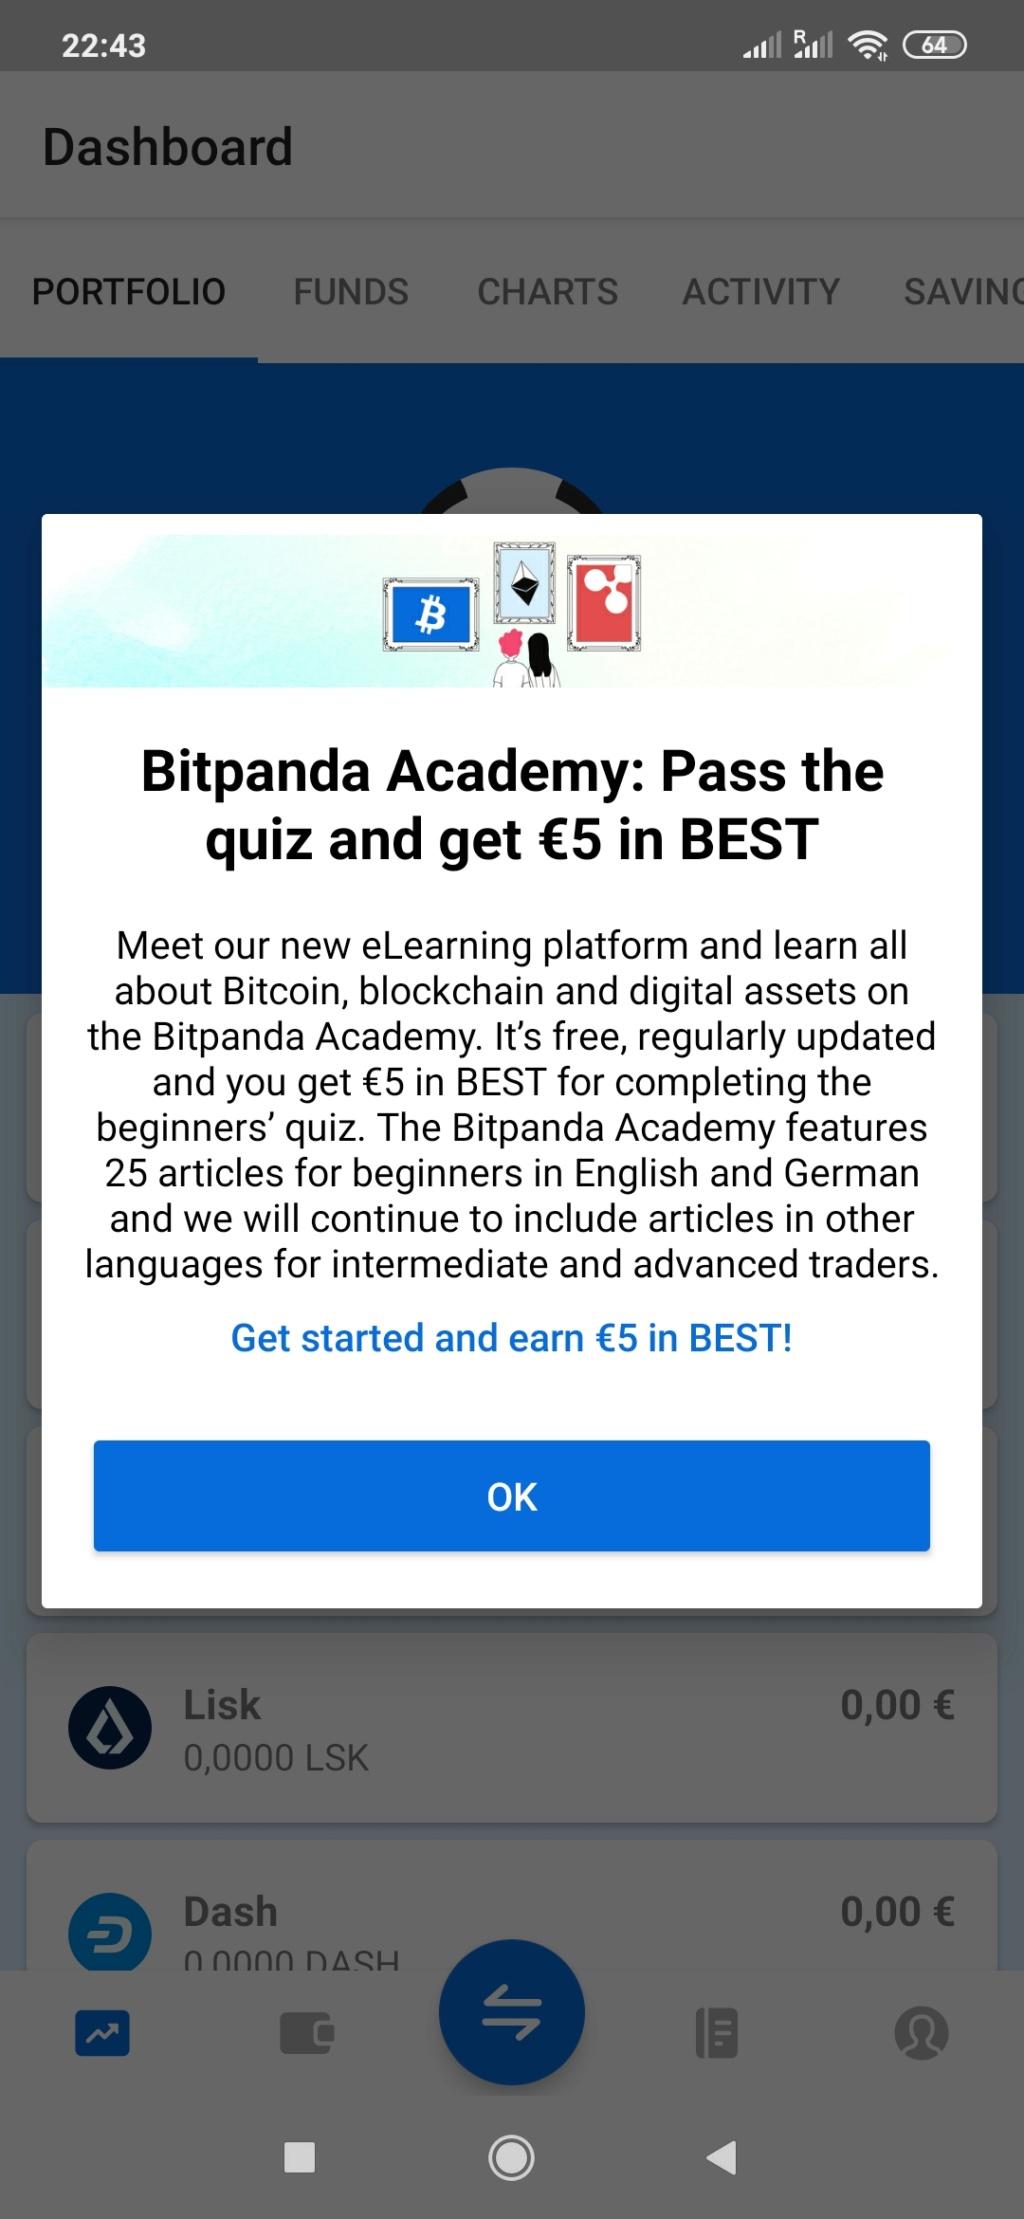 Bitpanda nowy wallet crypto 10 euro za transakcje + airdrop - Page 3 Screen10